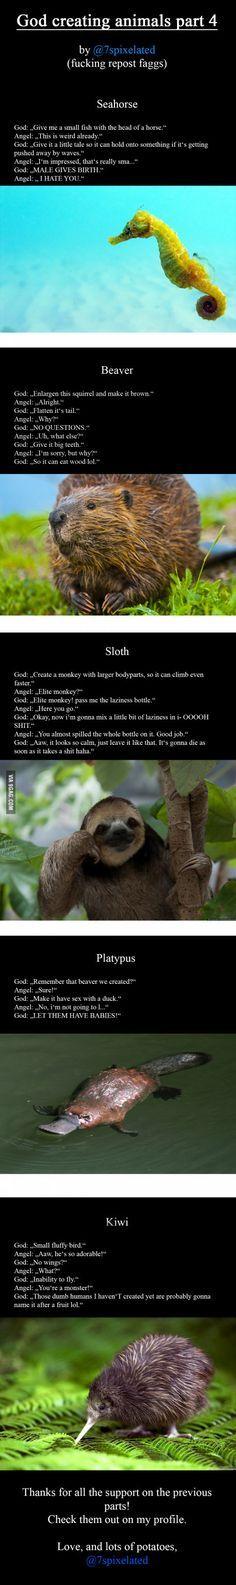 God creating animals part 4